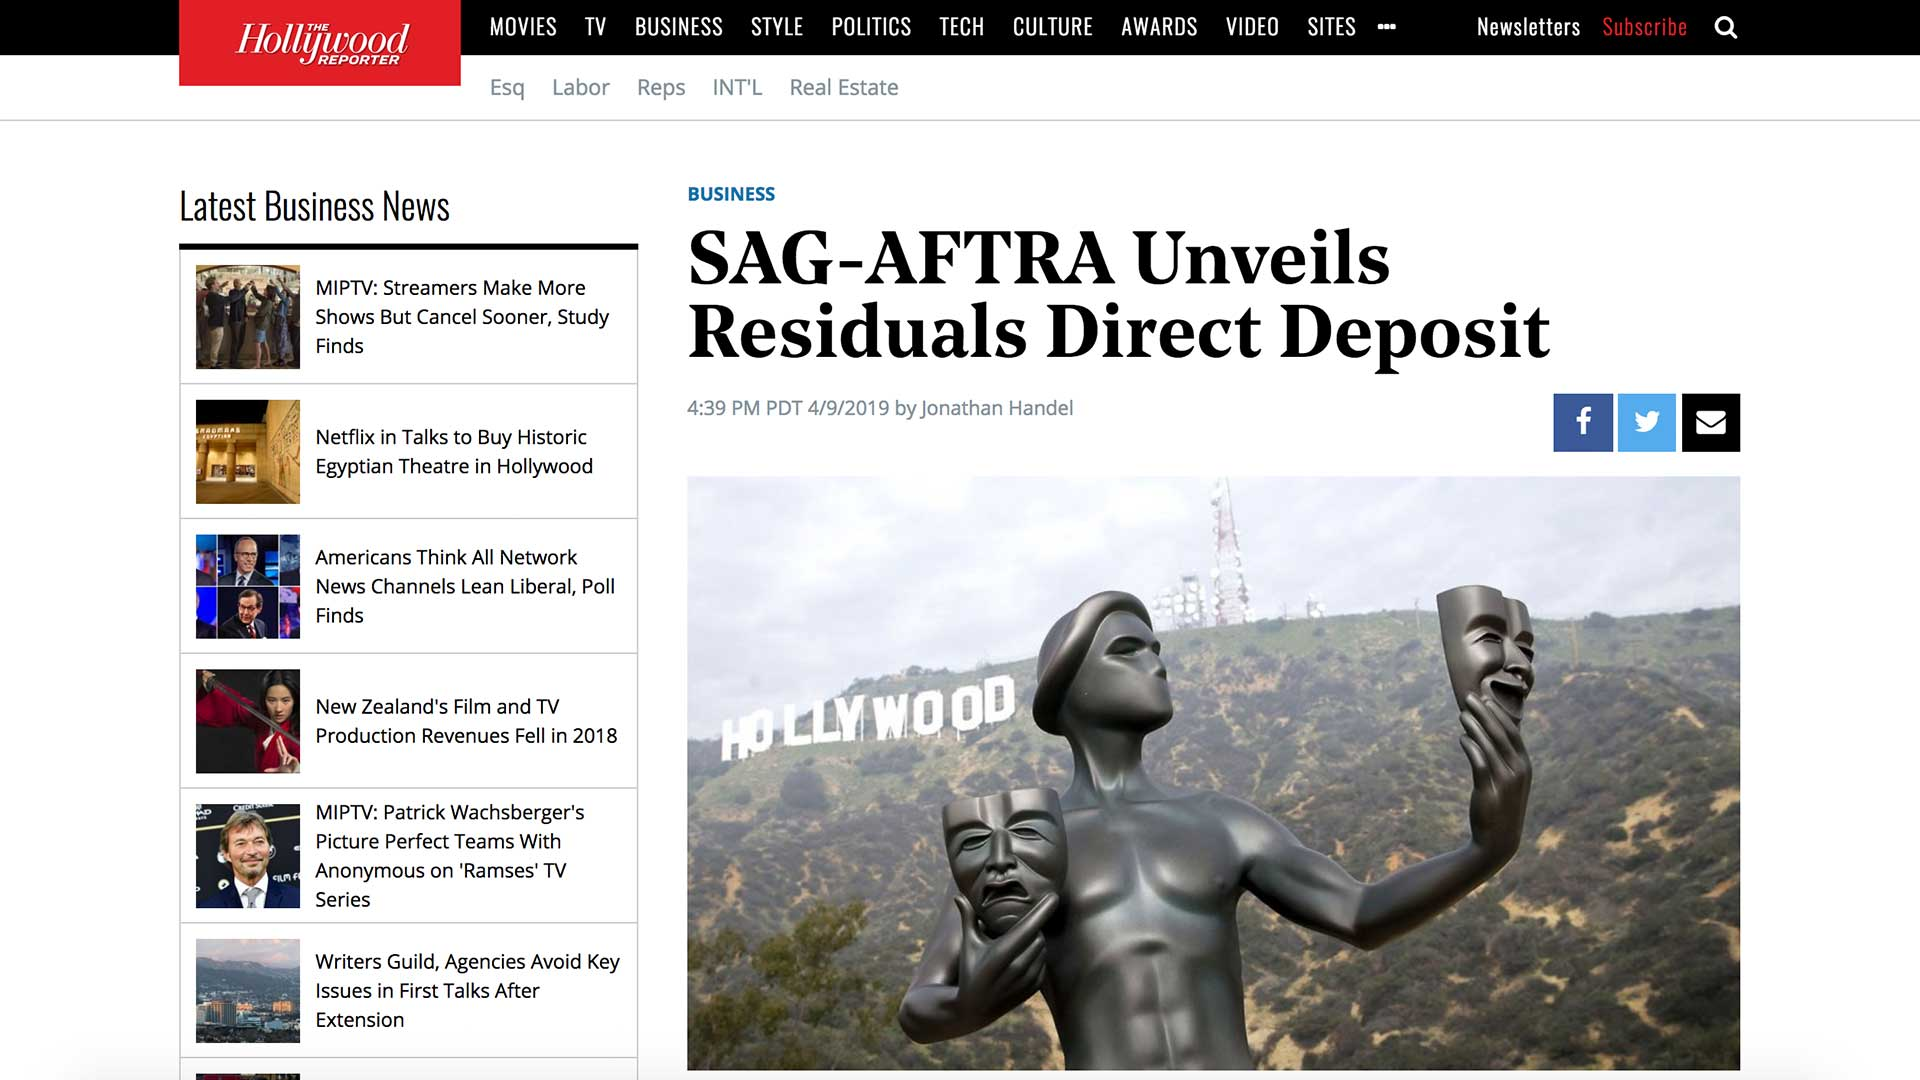 Fairness Rocks News SAG-AFTRA Unveils Residuals Direct Deposit